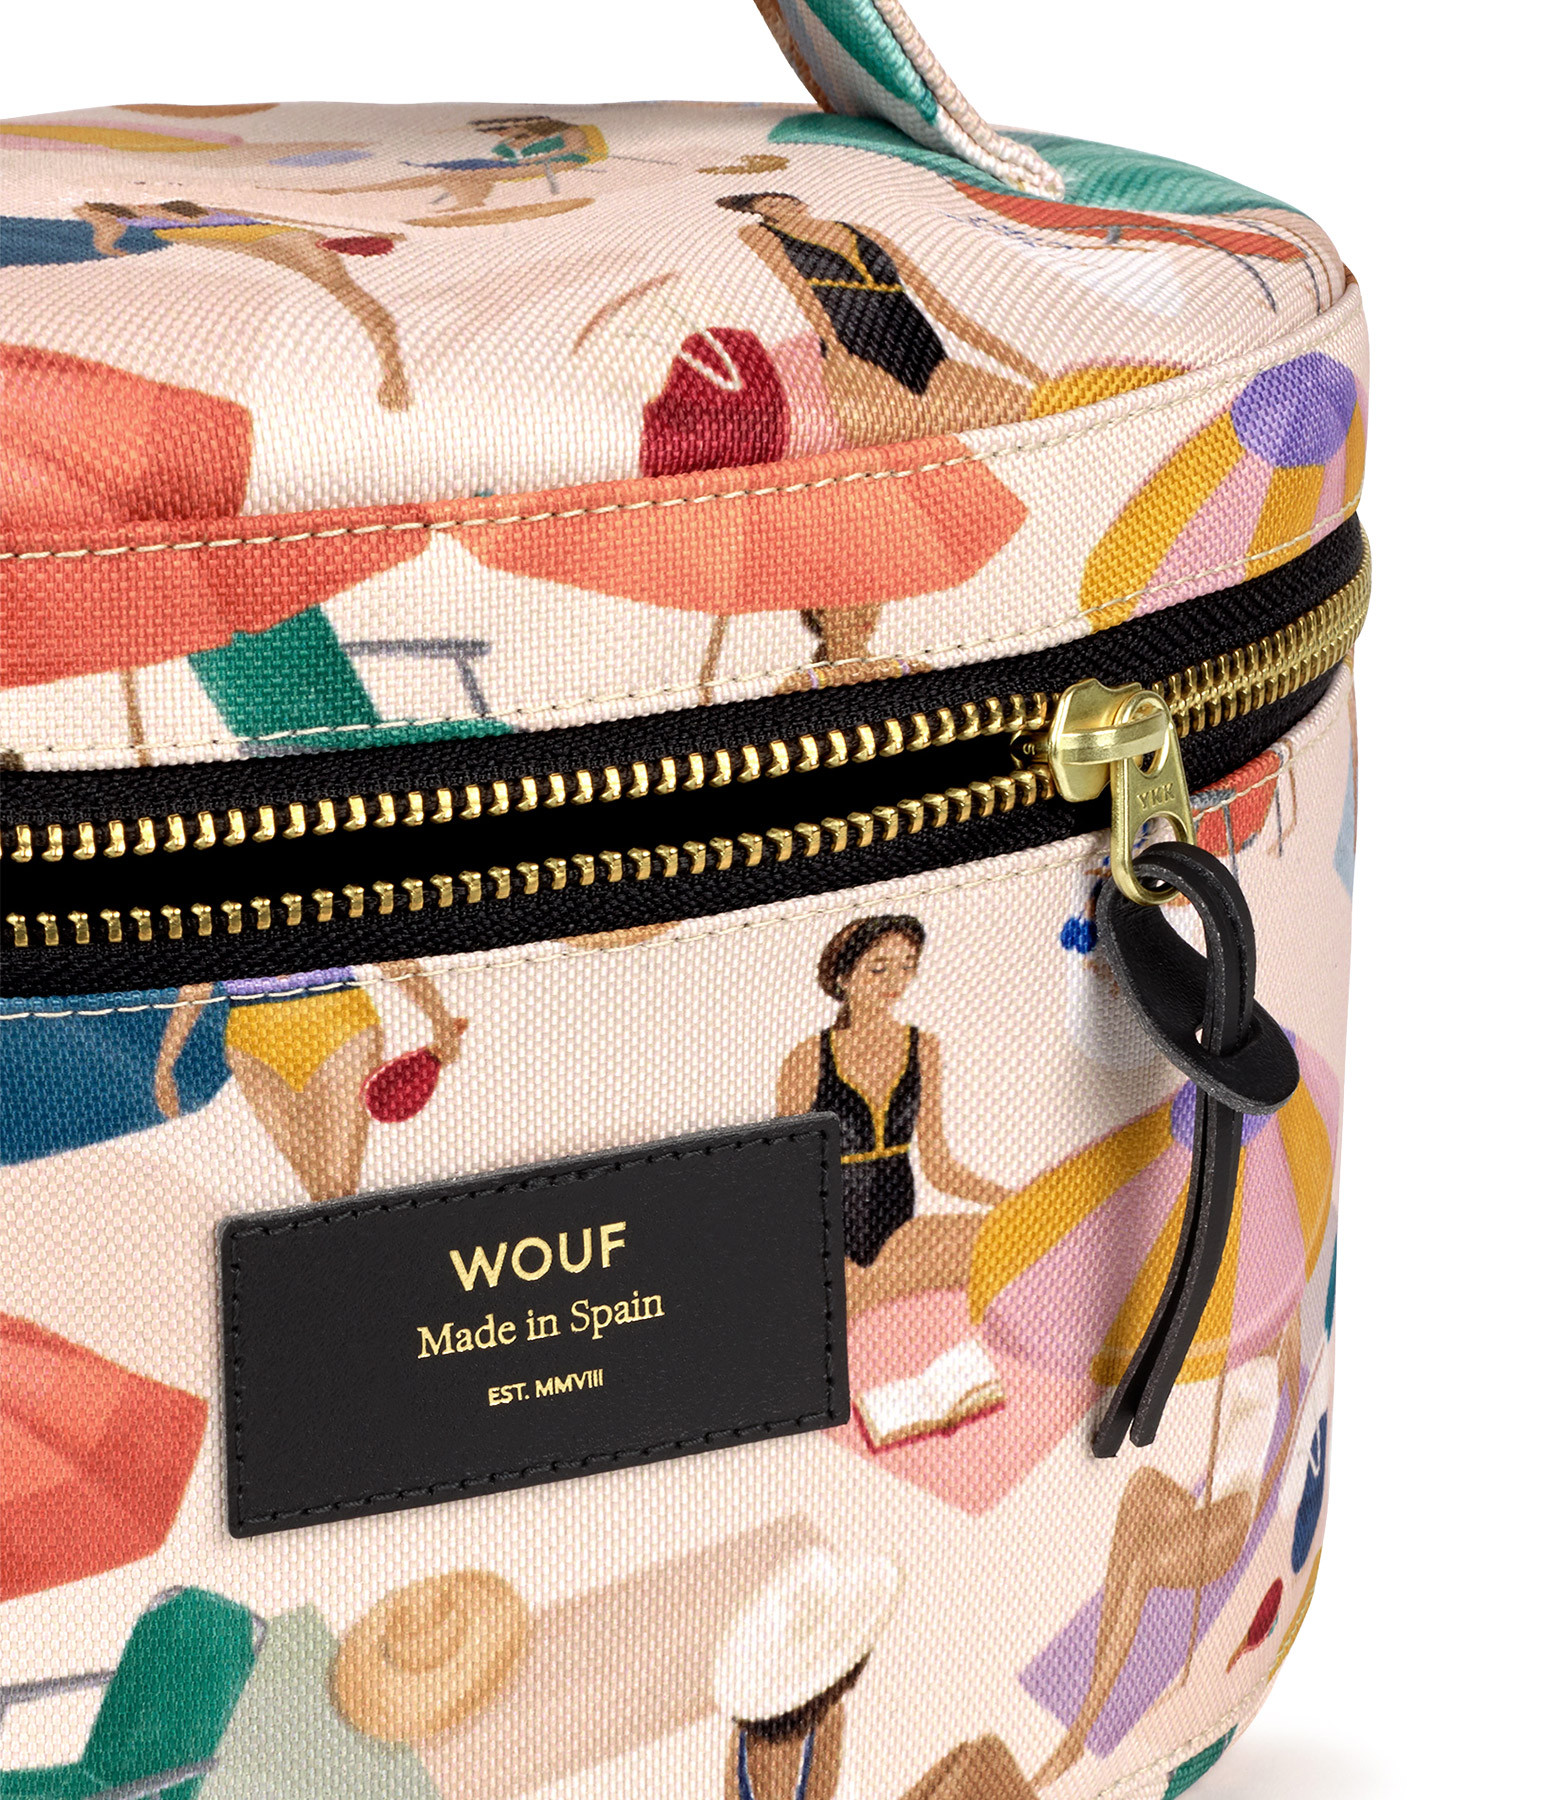 WOUF - Trousse XL Beauty Barceloneta